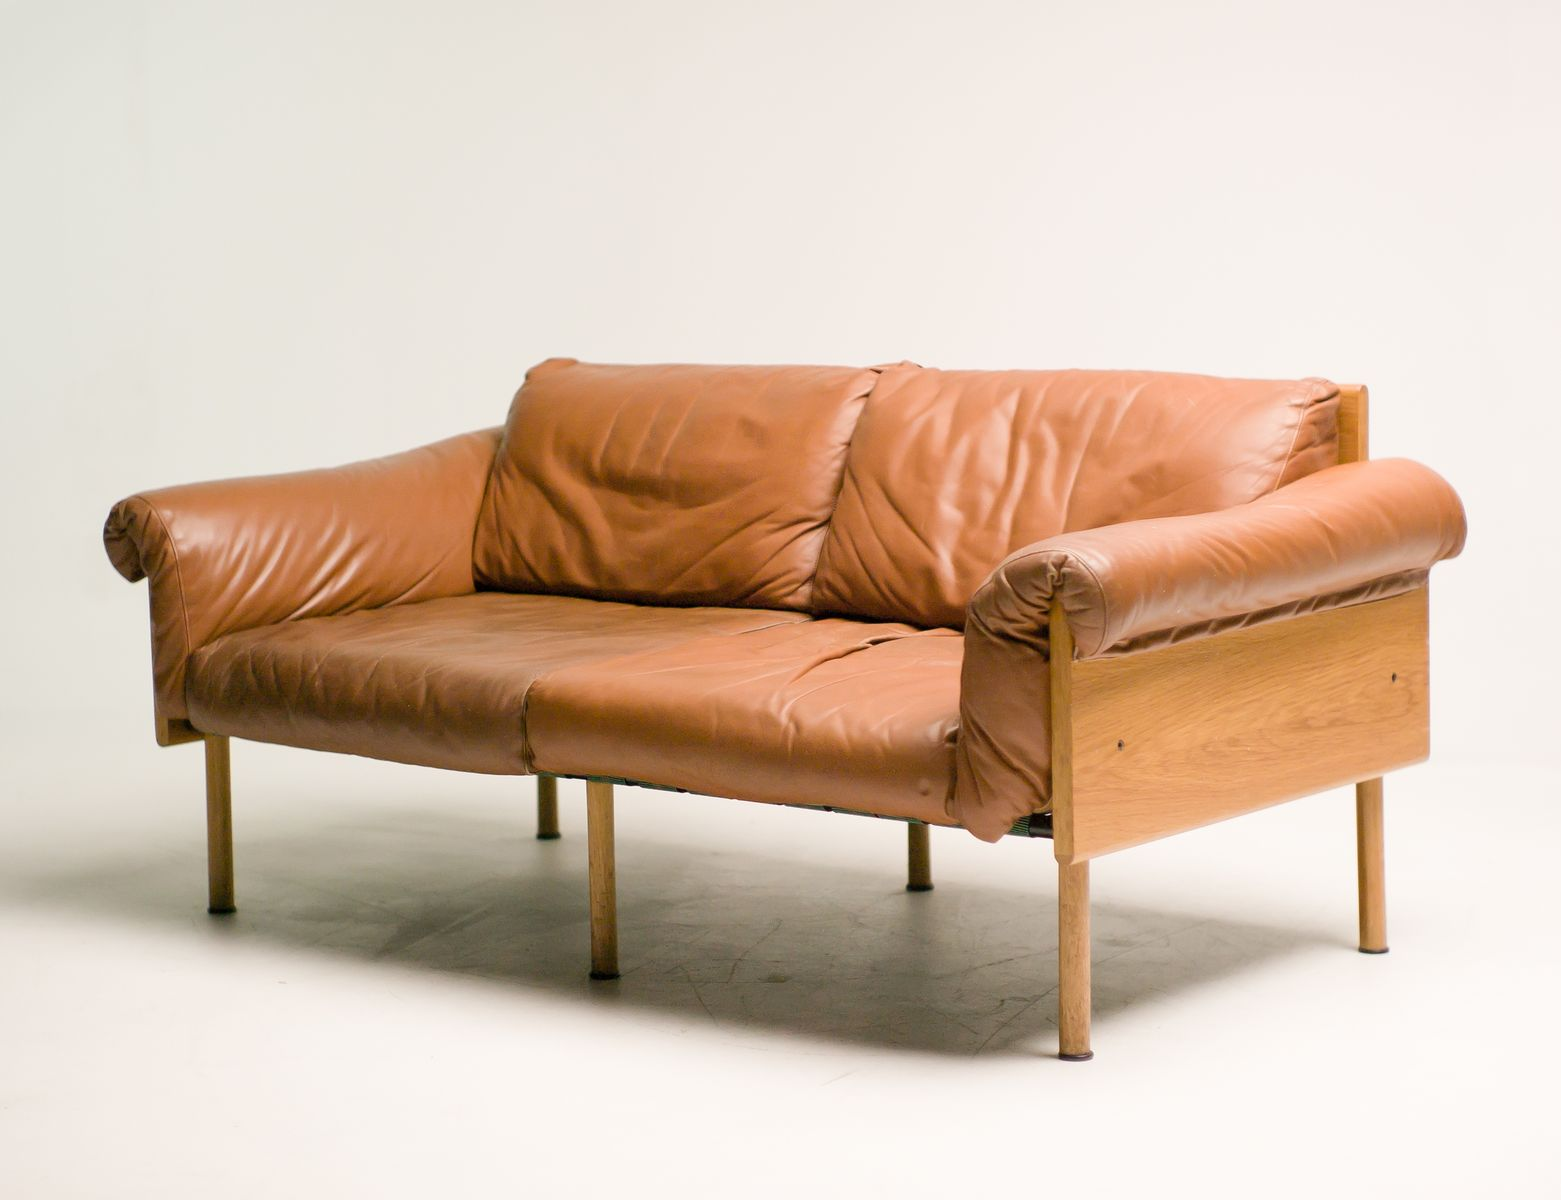 zwei sitzer vintage ateljee sofa von yrj kukkapuro f r haimi bei pamono kaufen. Black Bedroom Furniture Sets. Home Design Ideas